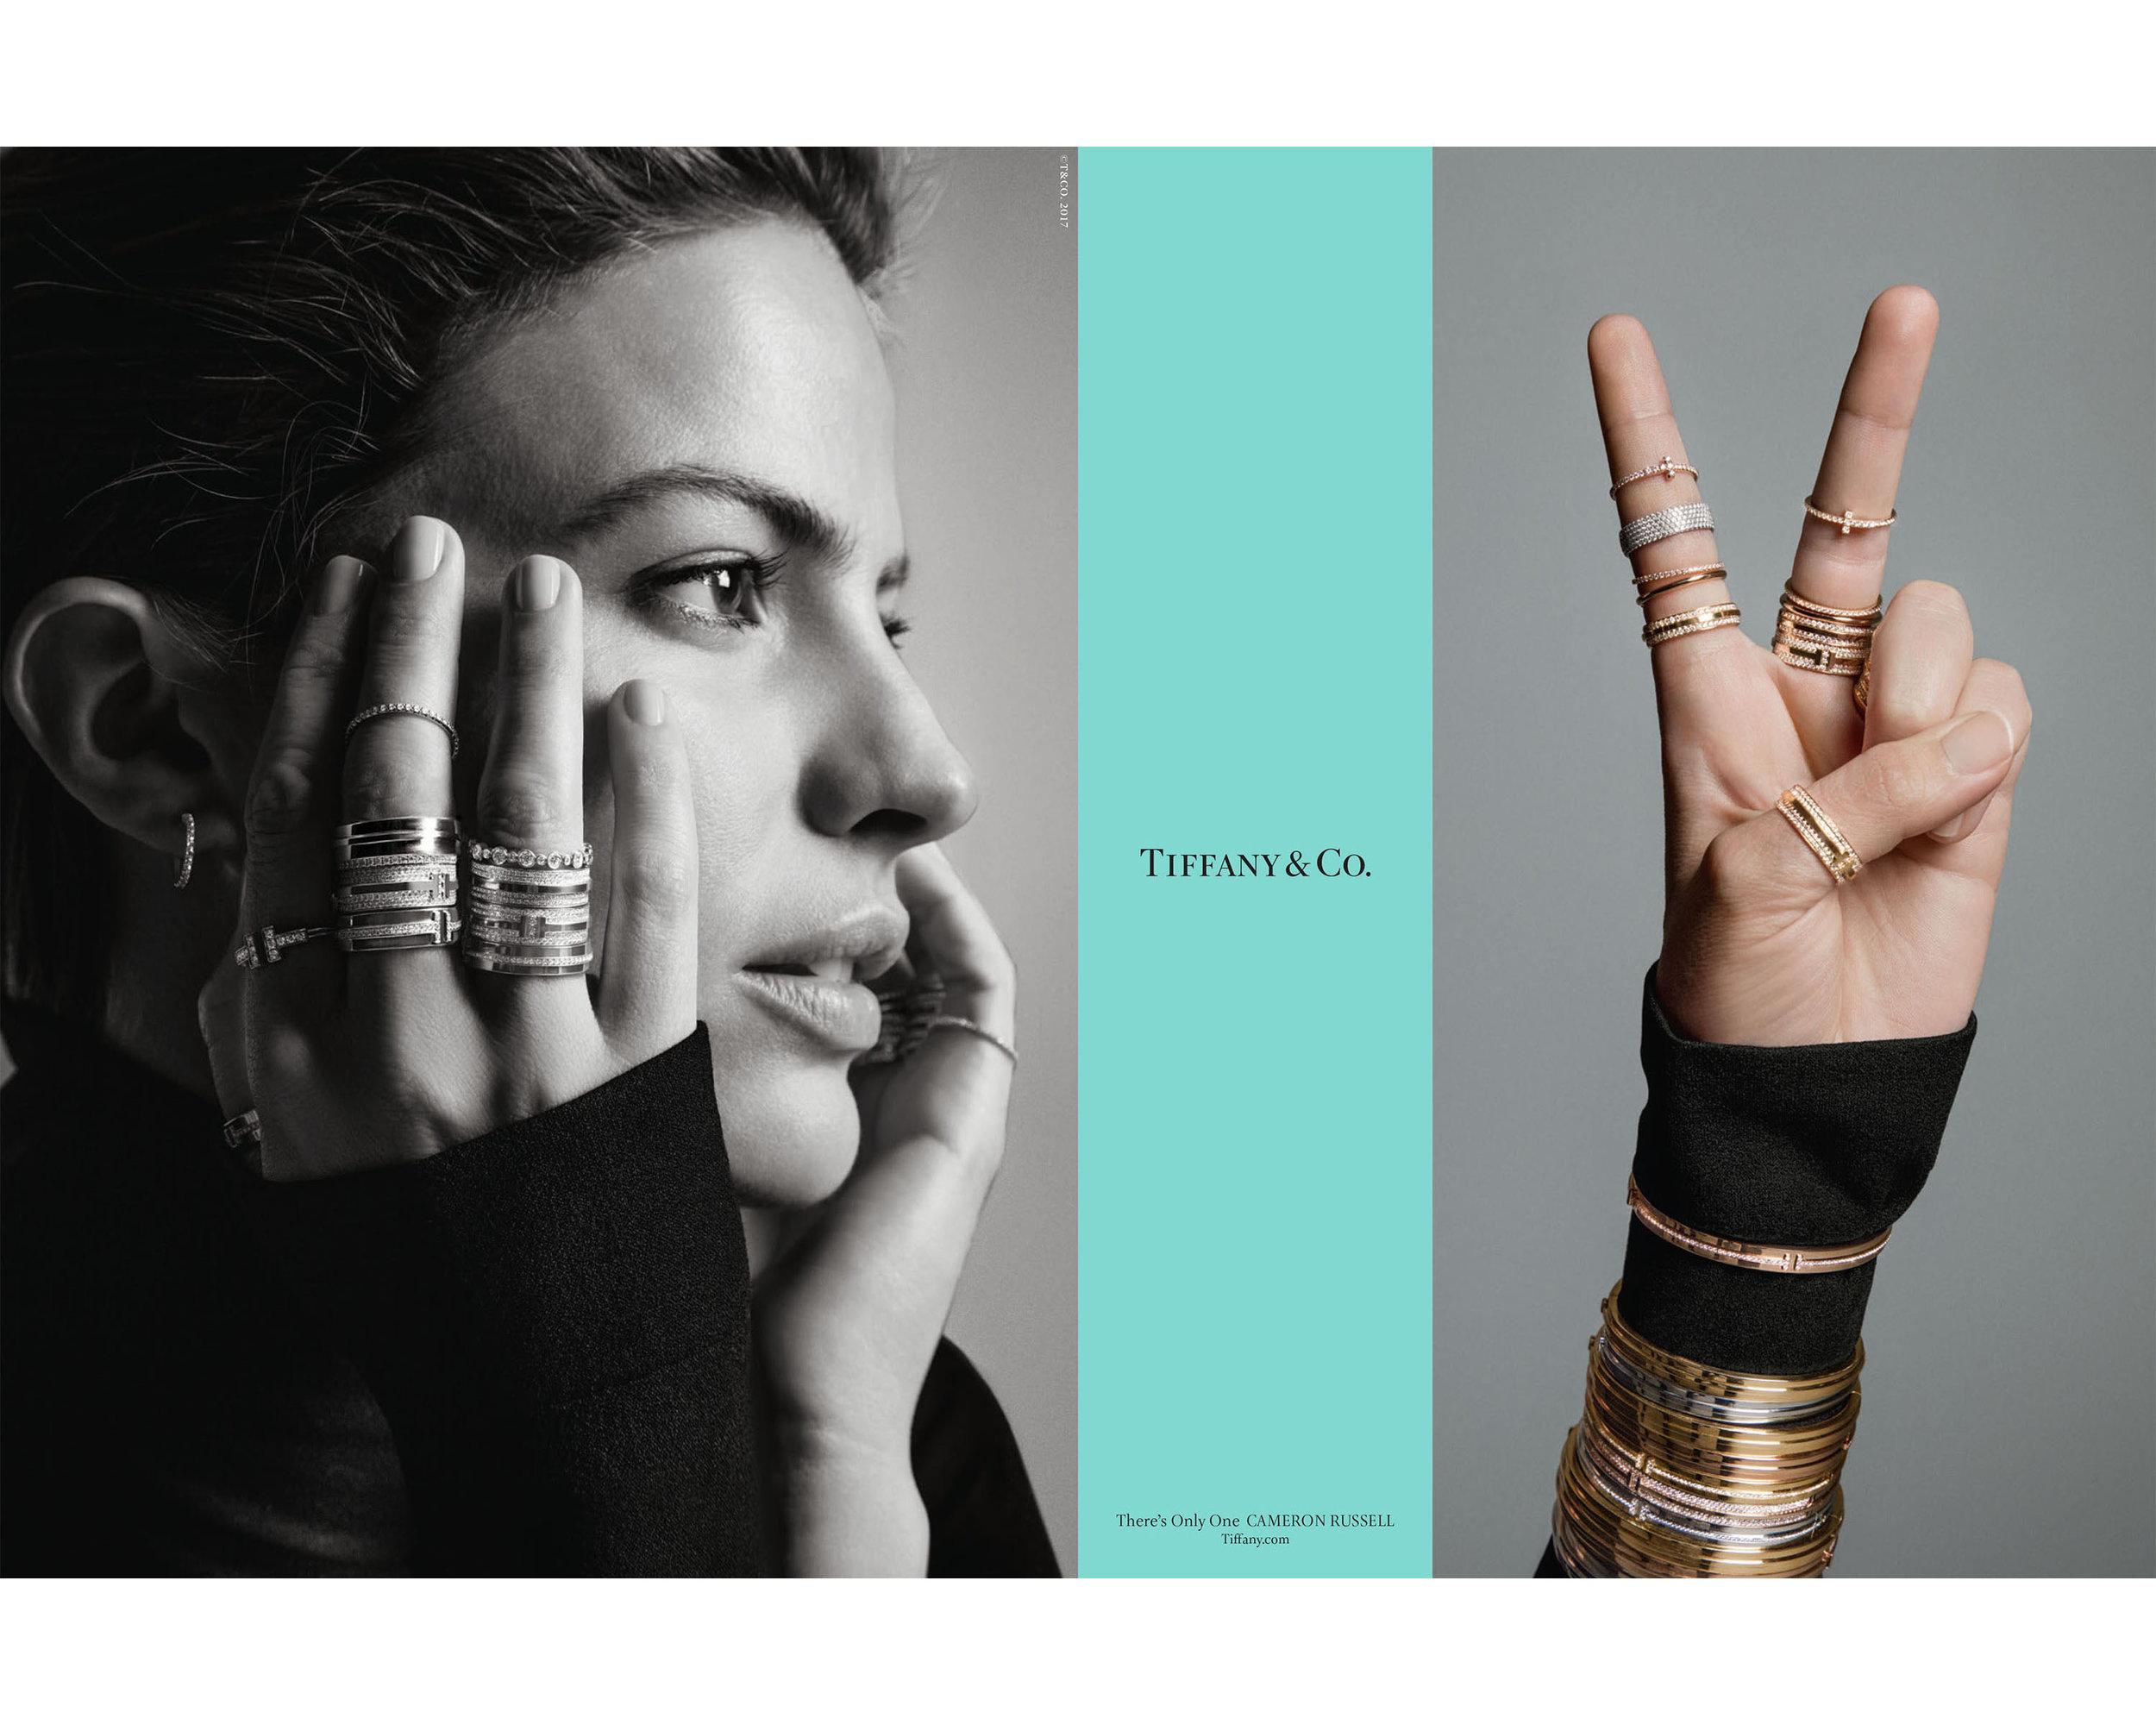 Tiffany & CO. Cameron-Russell-an-_4509.jpg